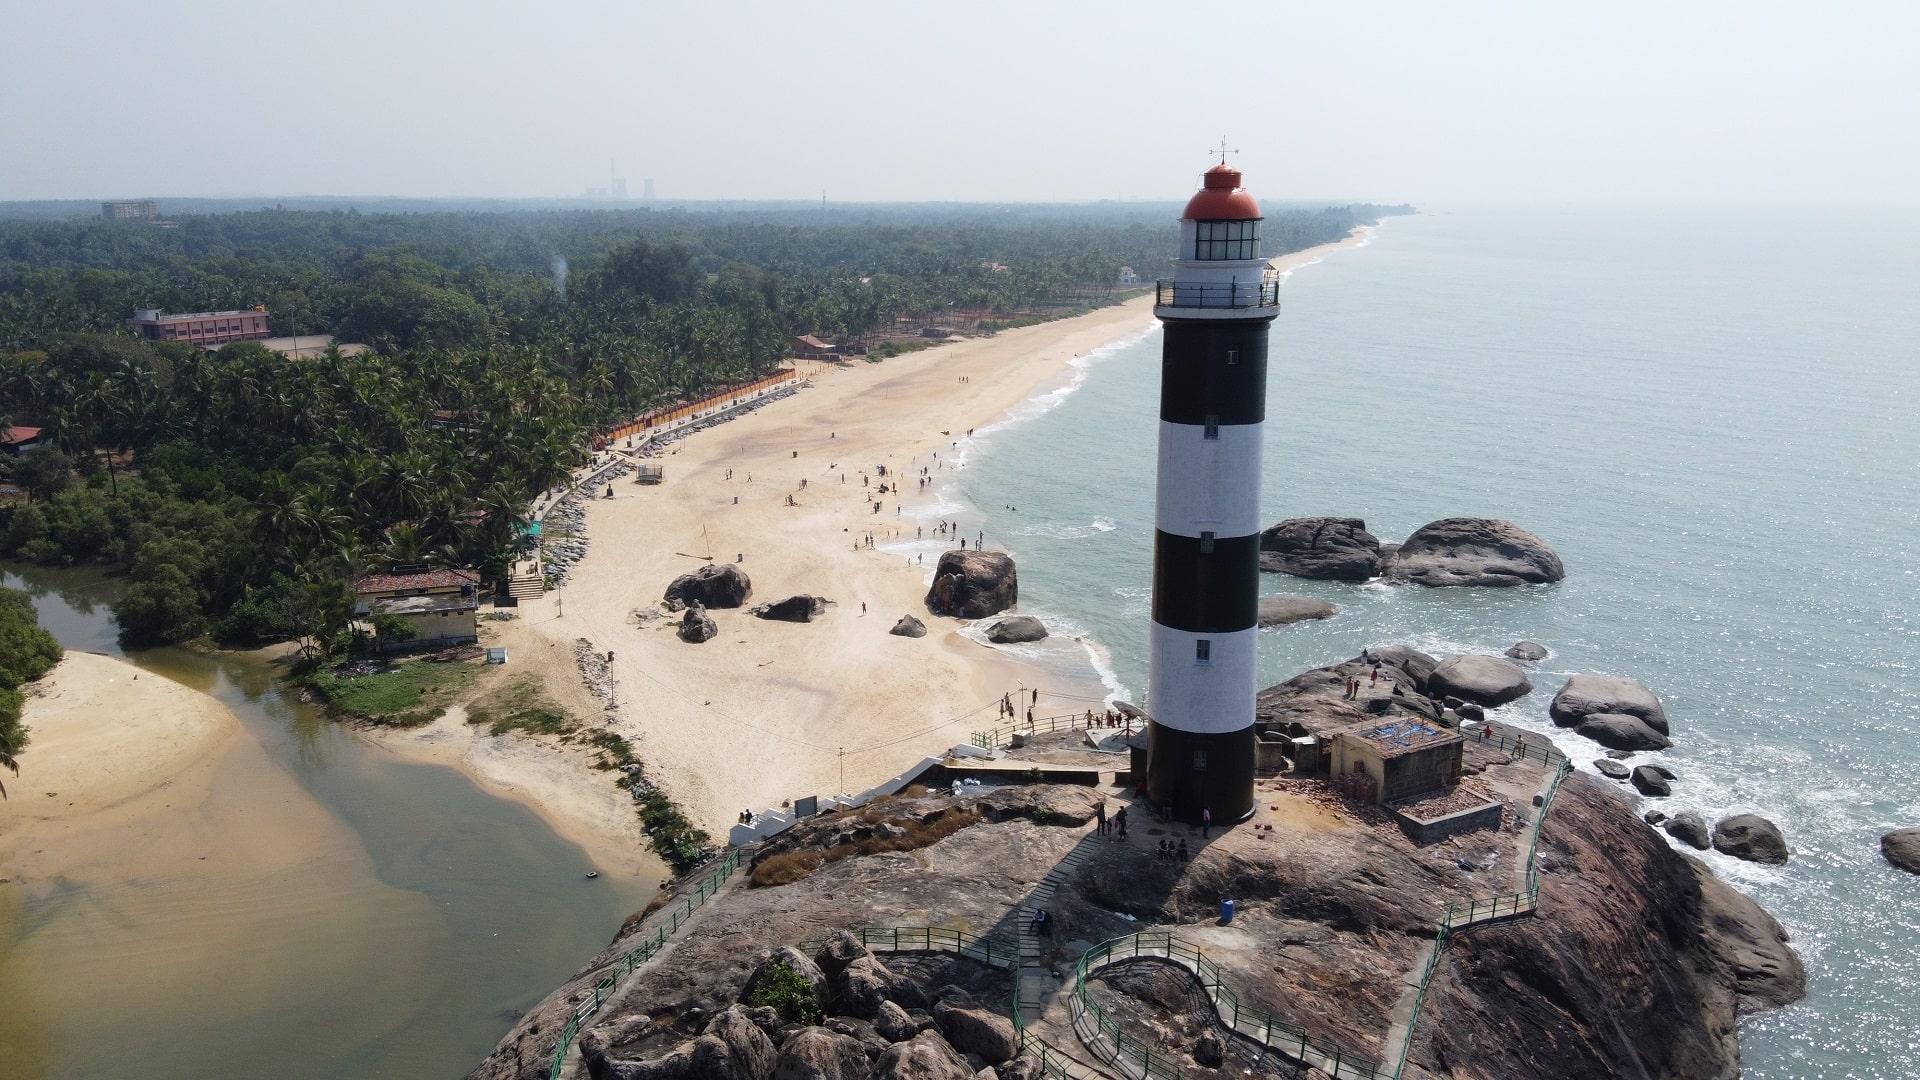 Kapu beach and lighthouse - Udupi tourism |Karnataka